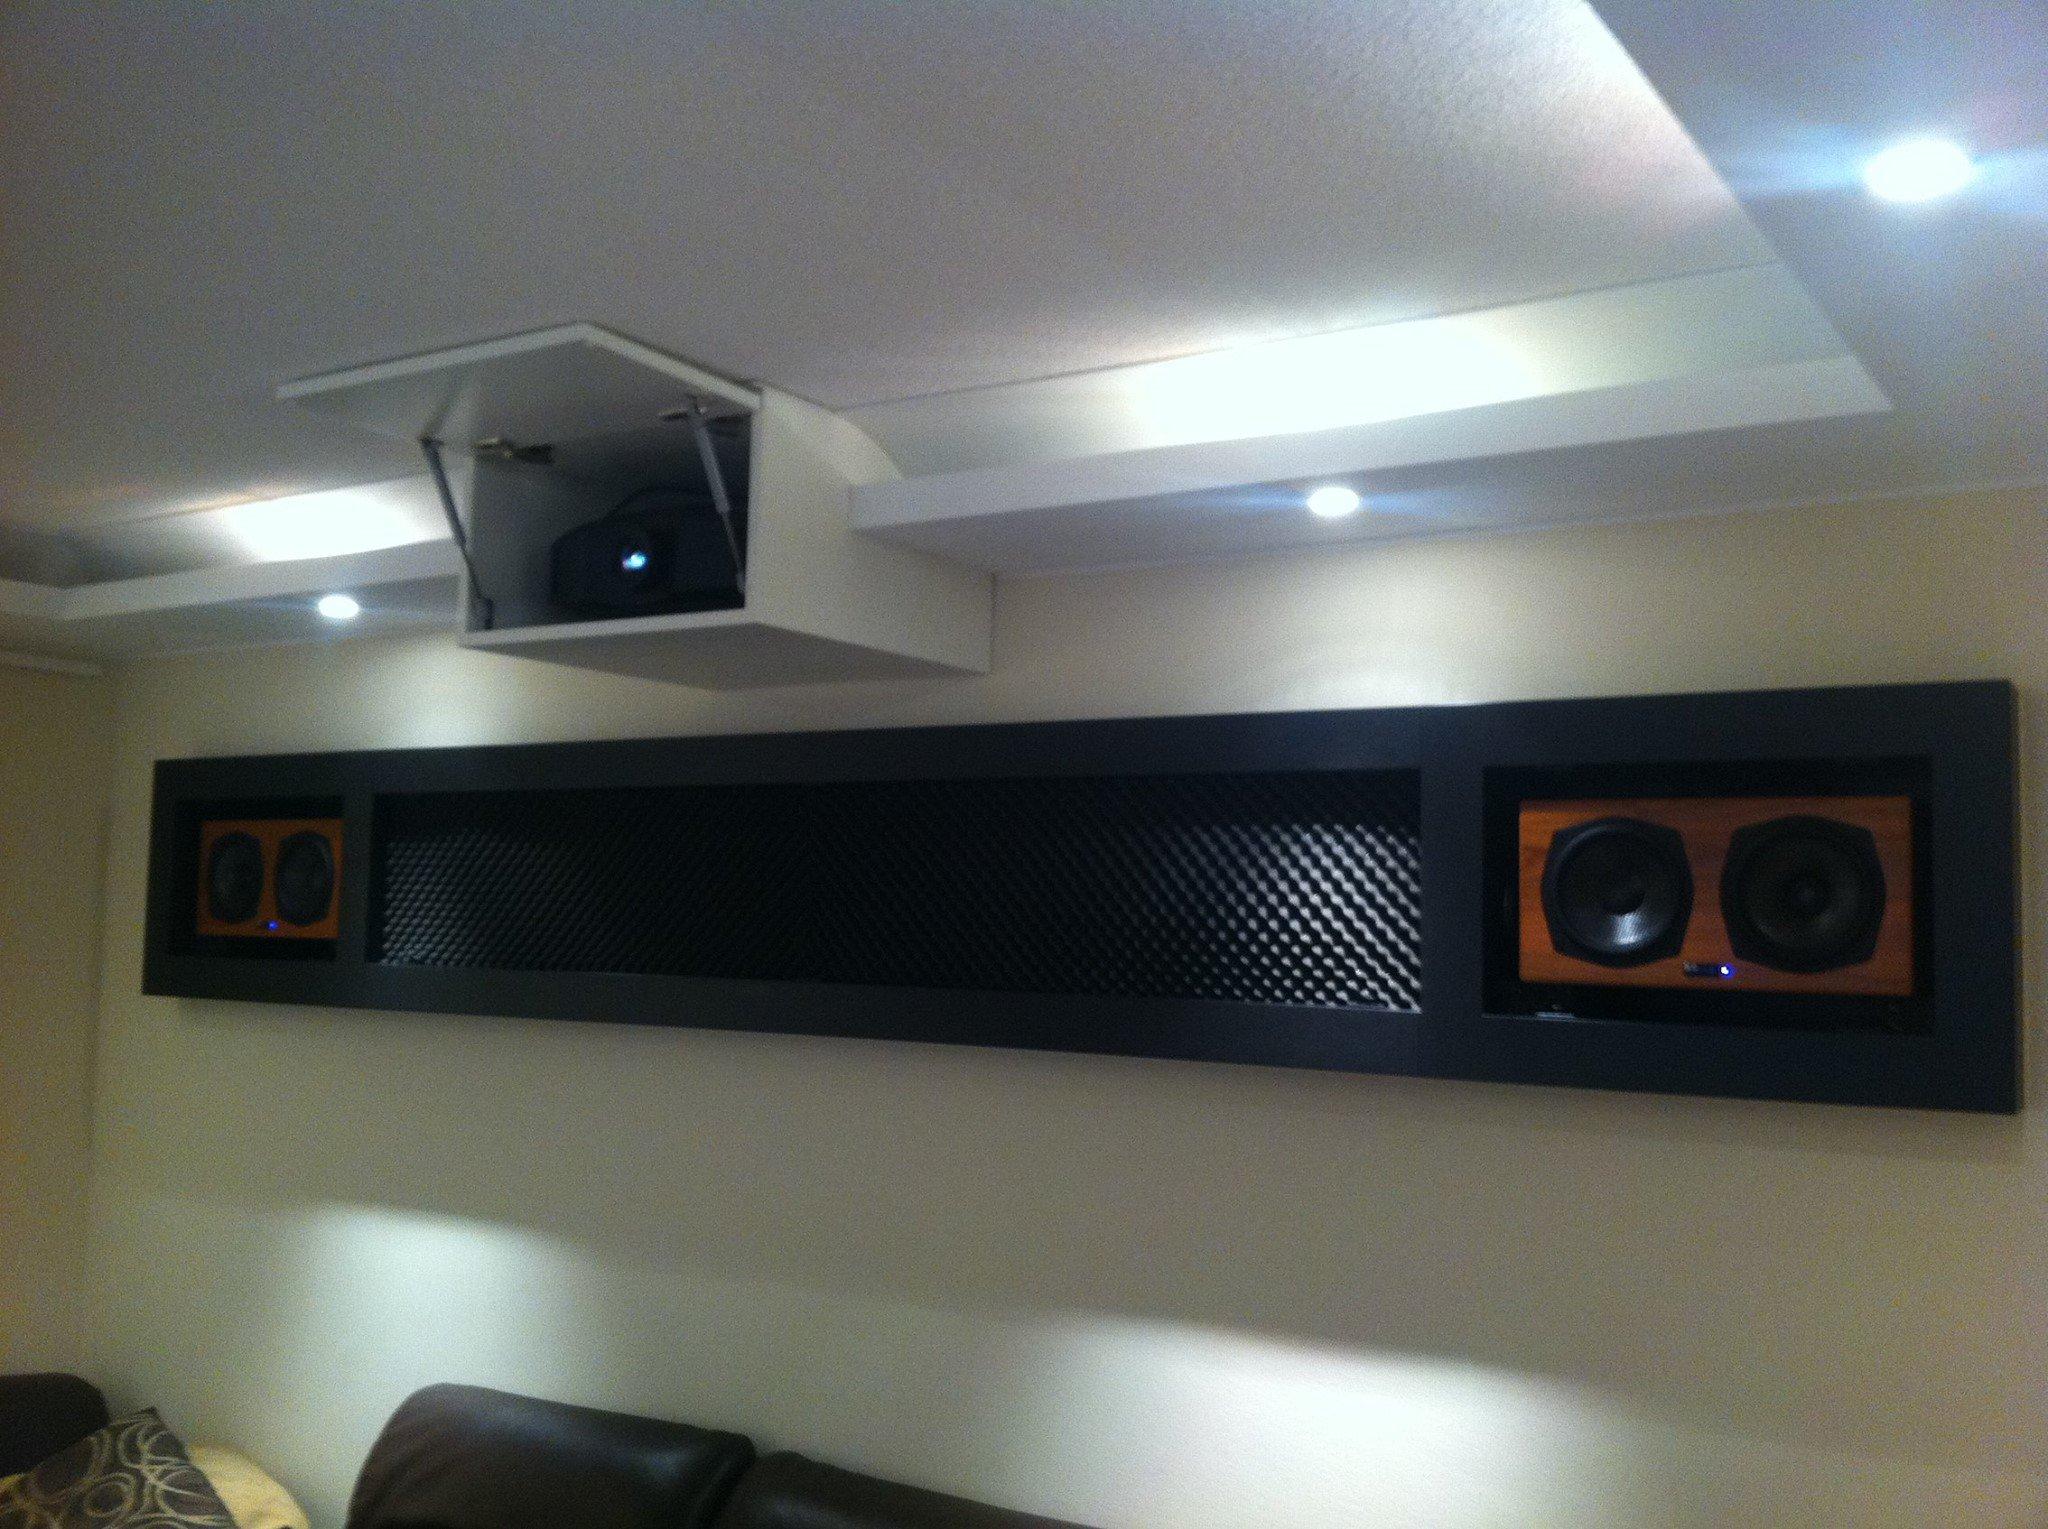 kunden heimkino box installation by team osnabr ck. Black Bedroom Furniture Sets. Home Design Ideas